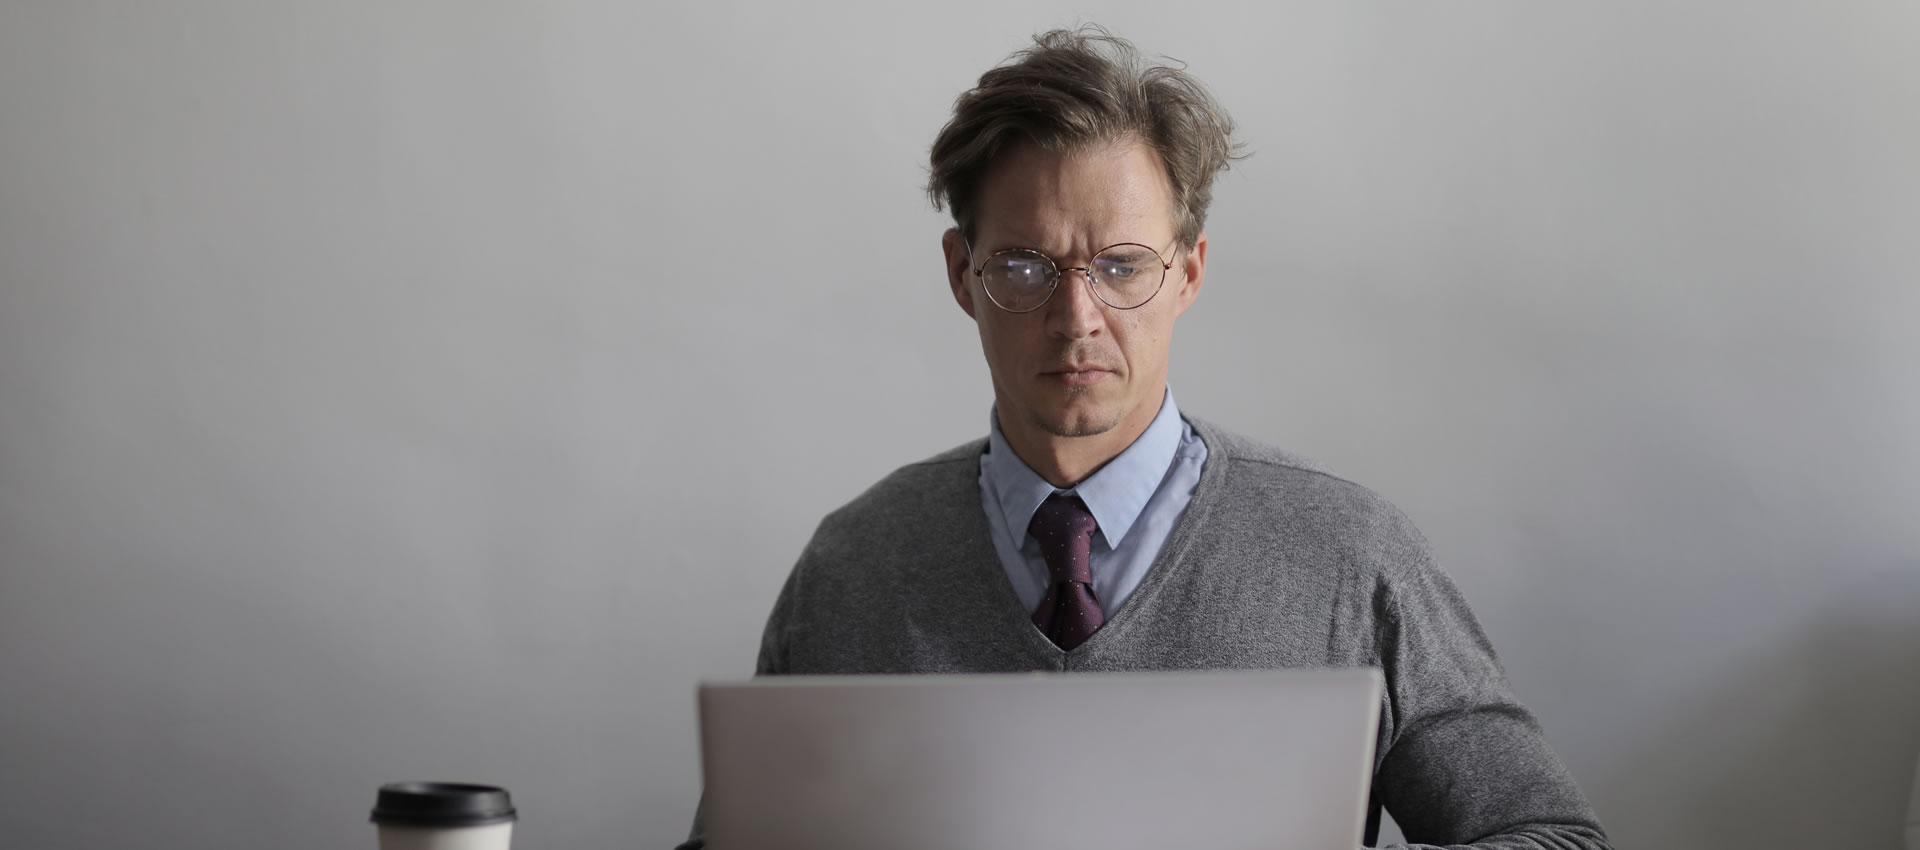 Resolving Disputes Online